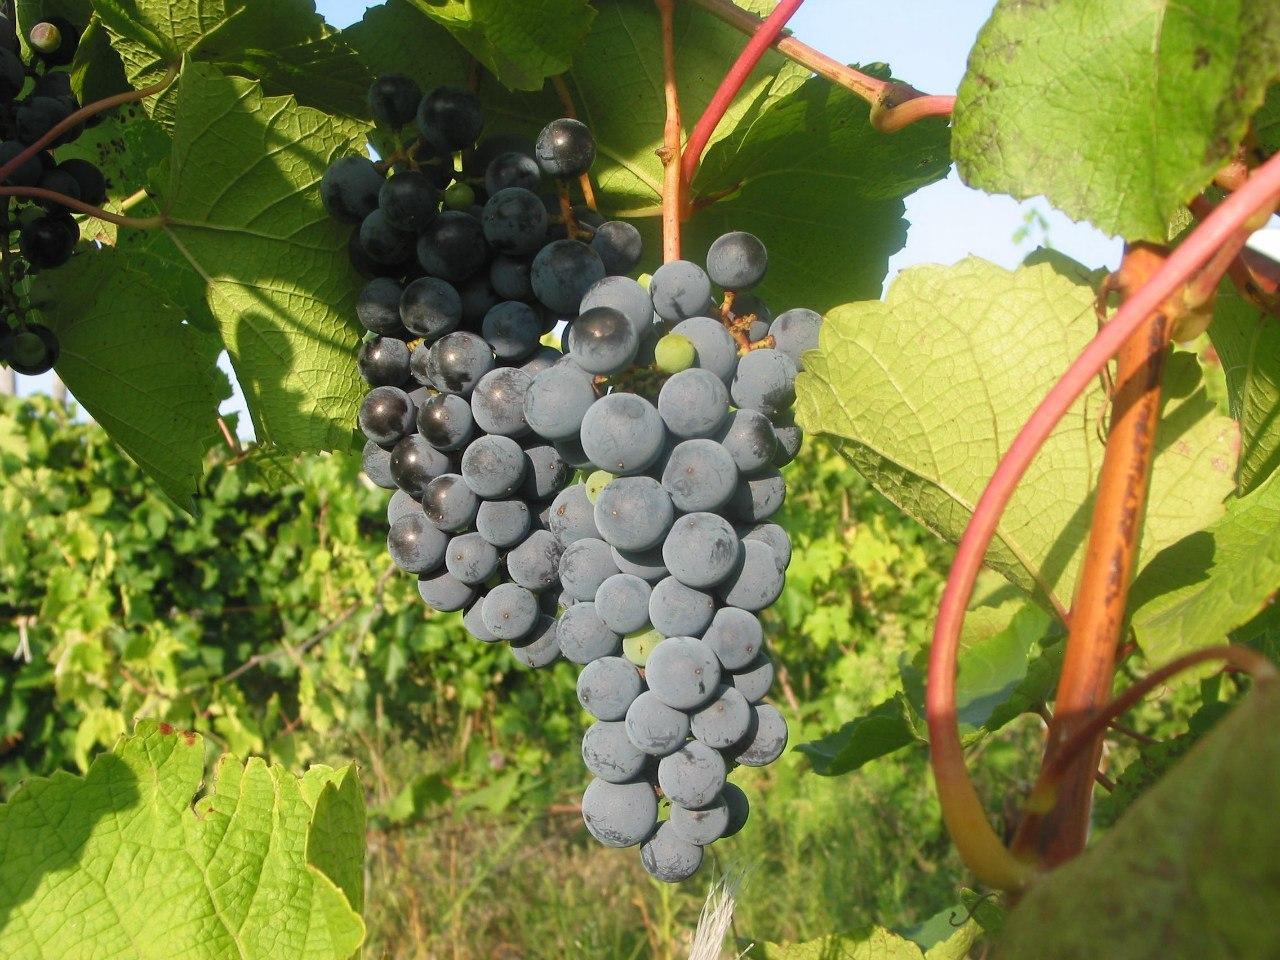 крымский виноград эким кара